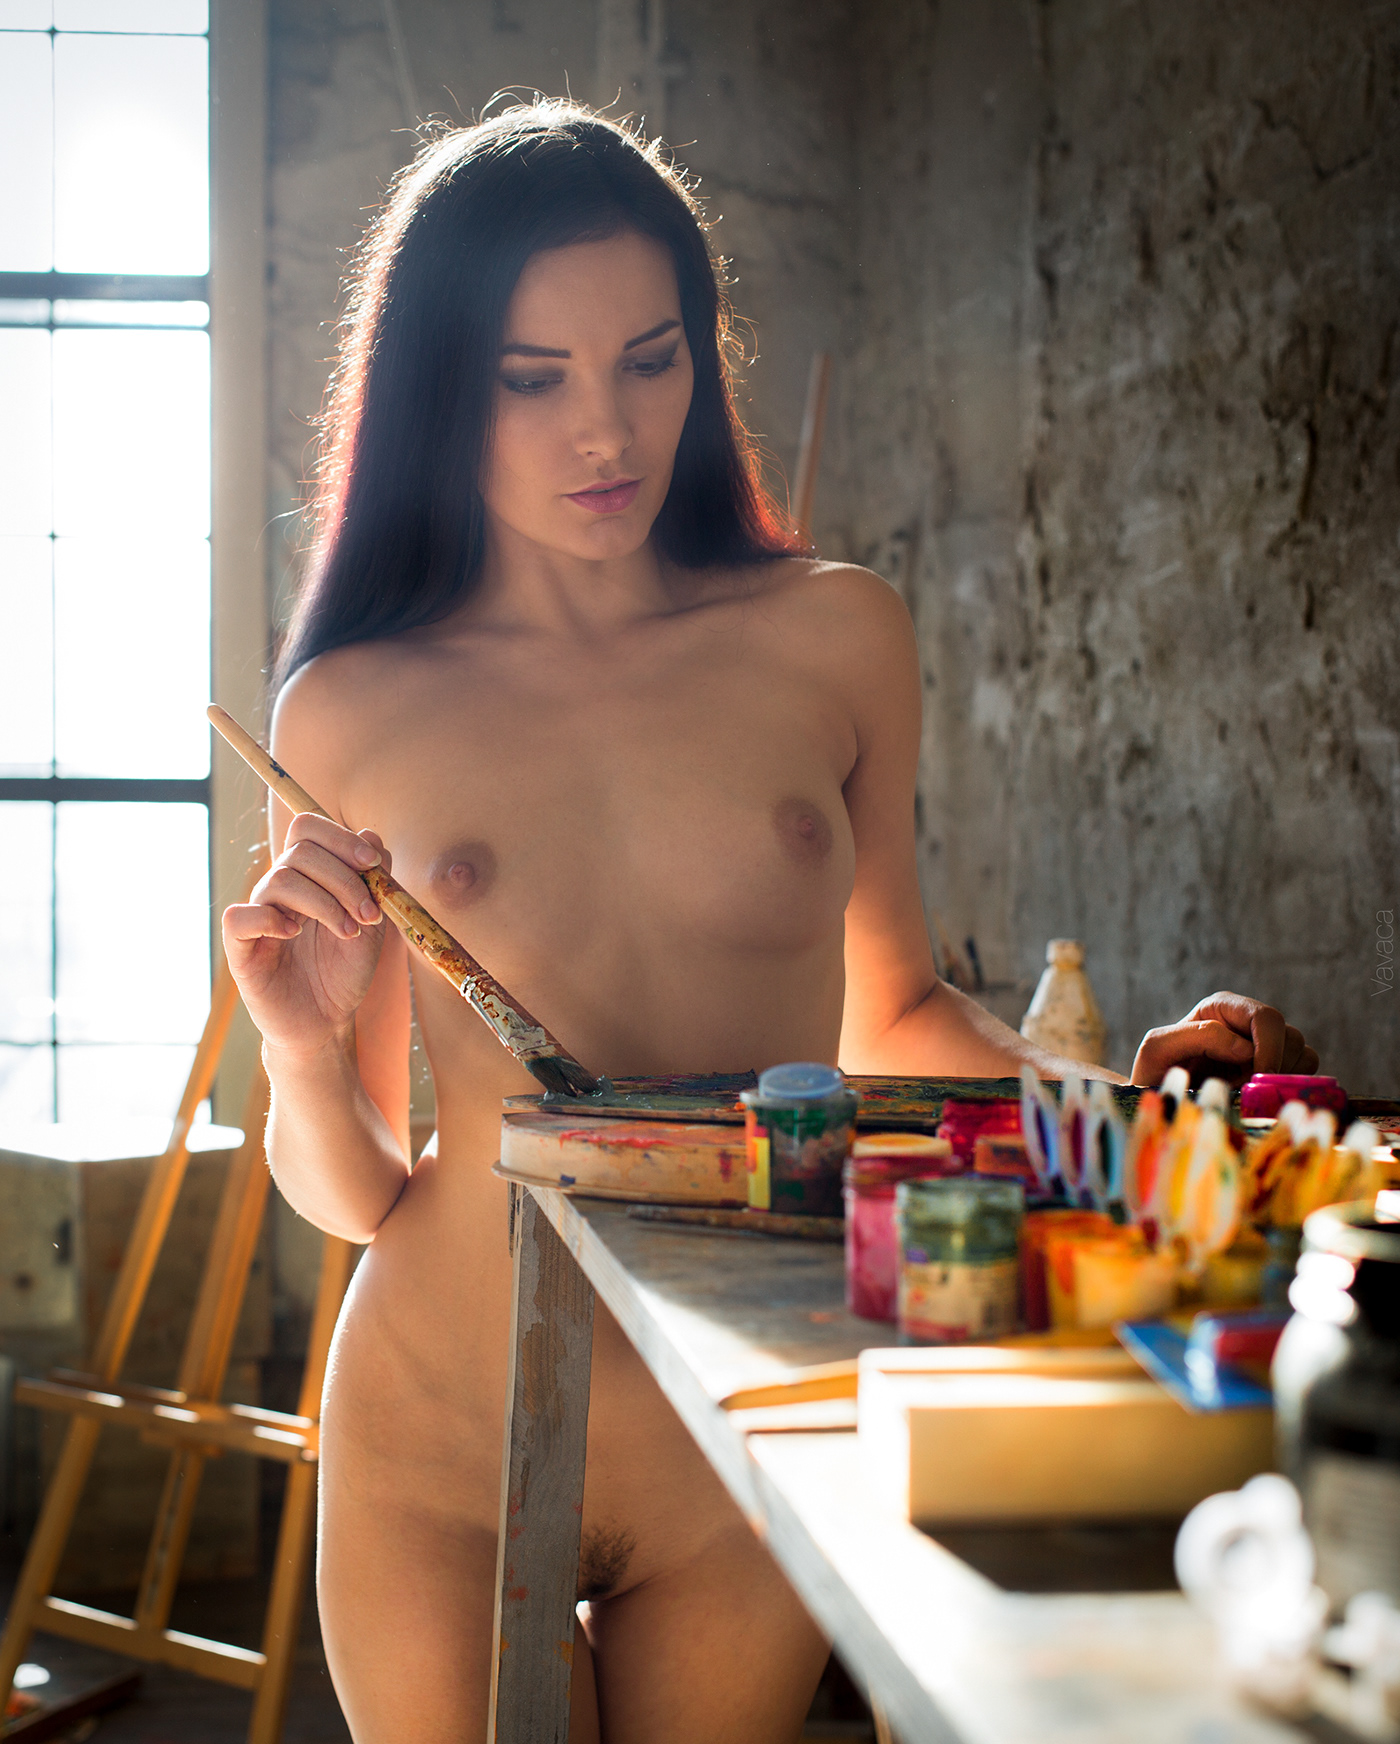 Morning Painting * Model Chira Kovalsky / фото Vladimir Nikolaev